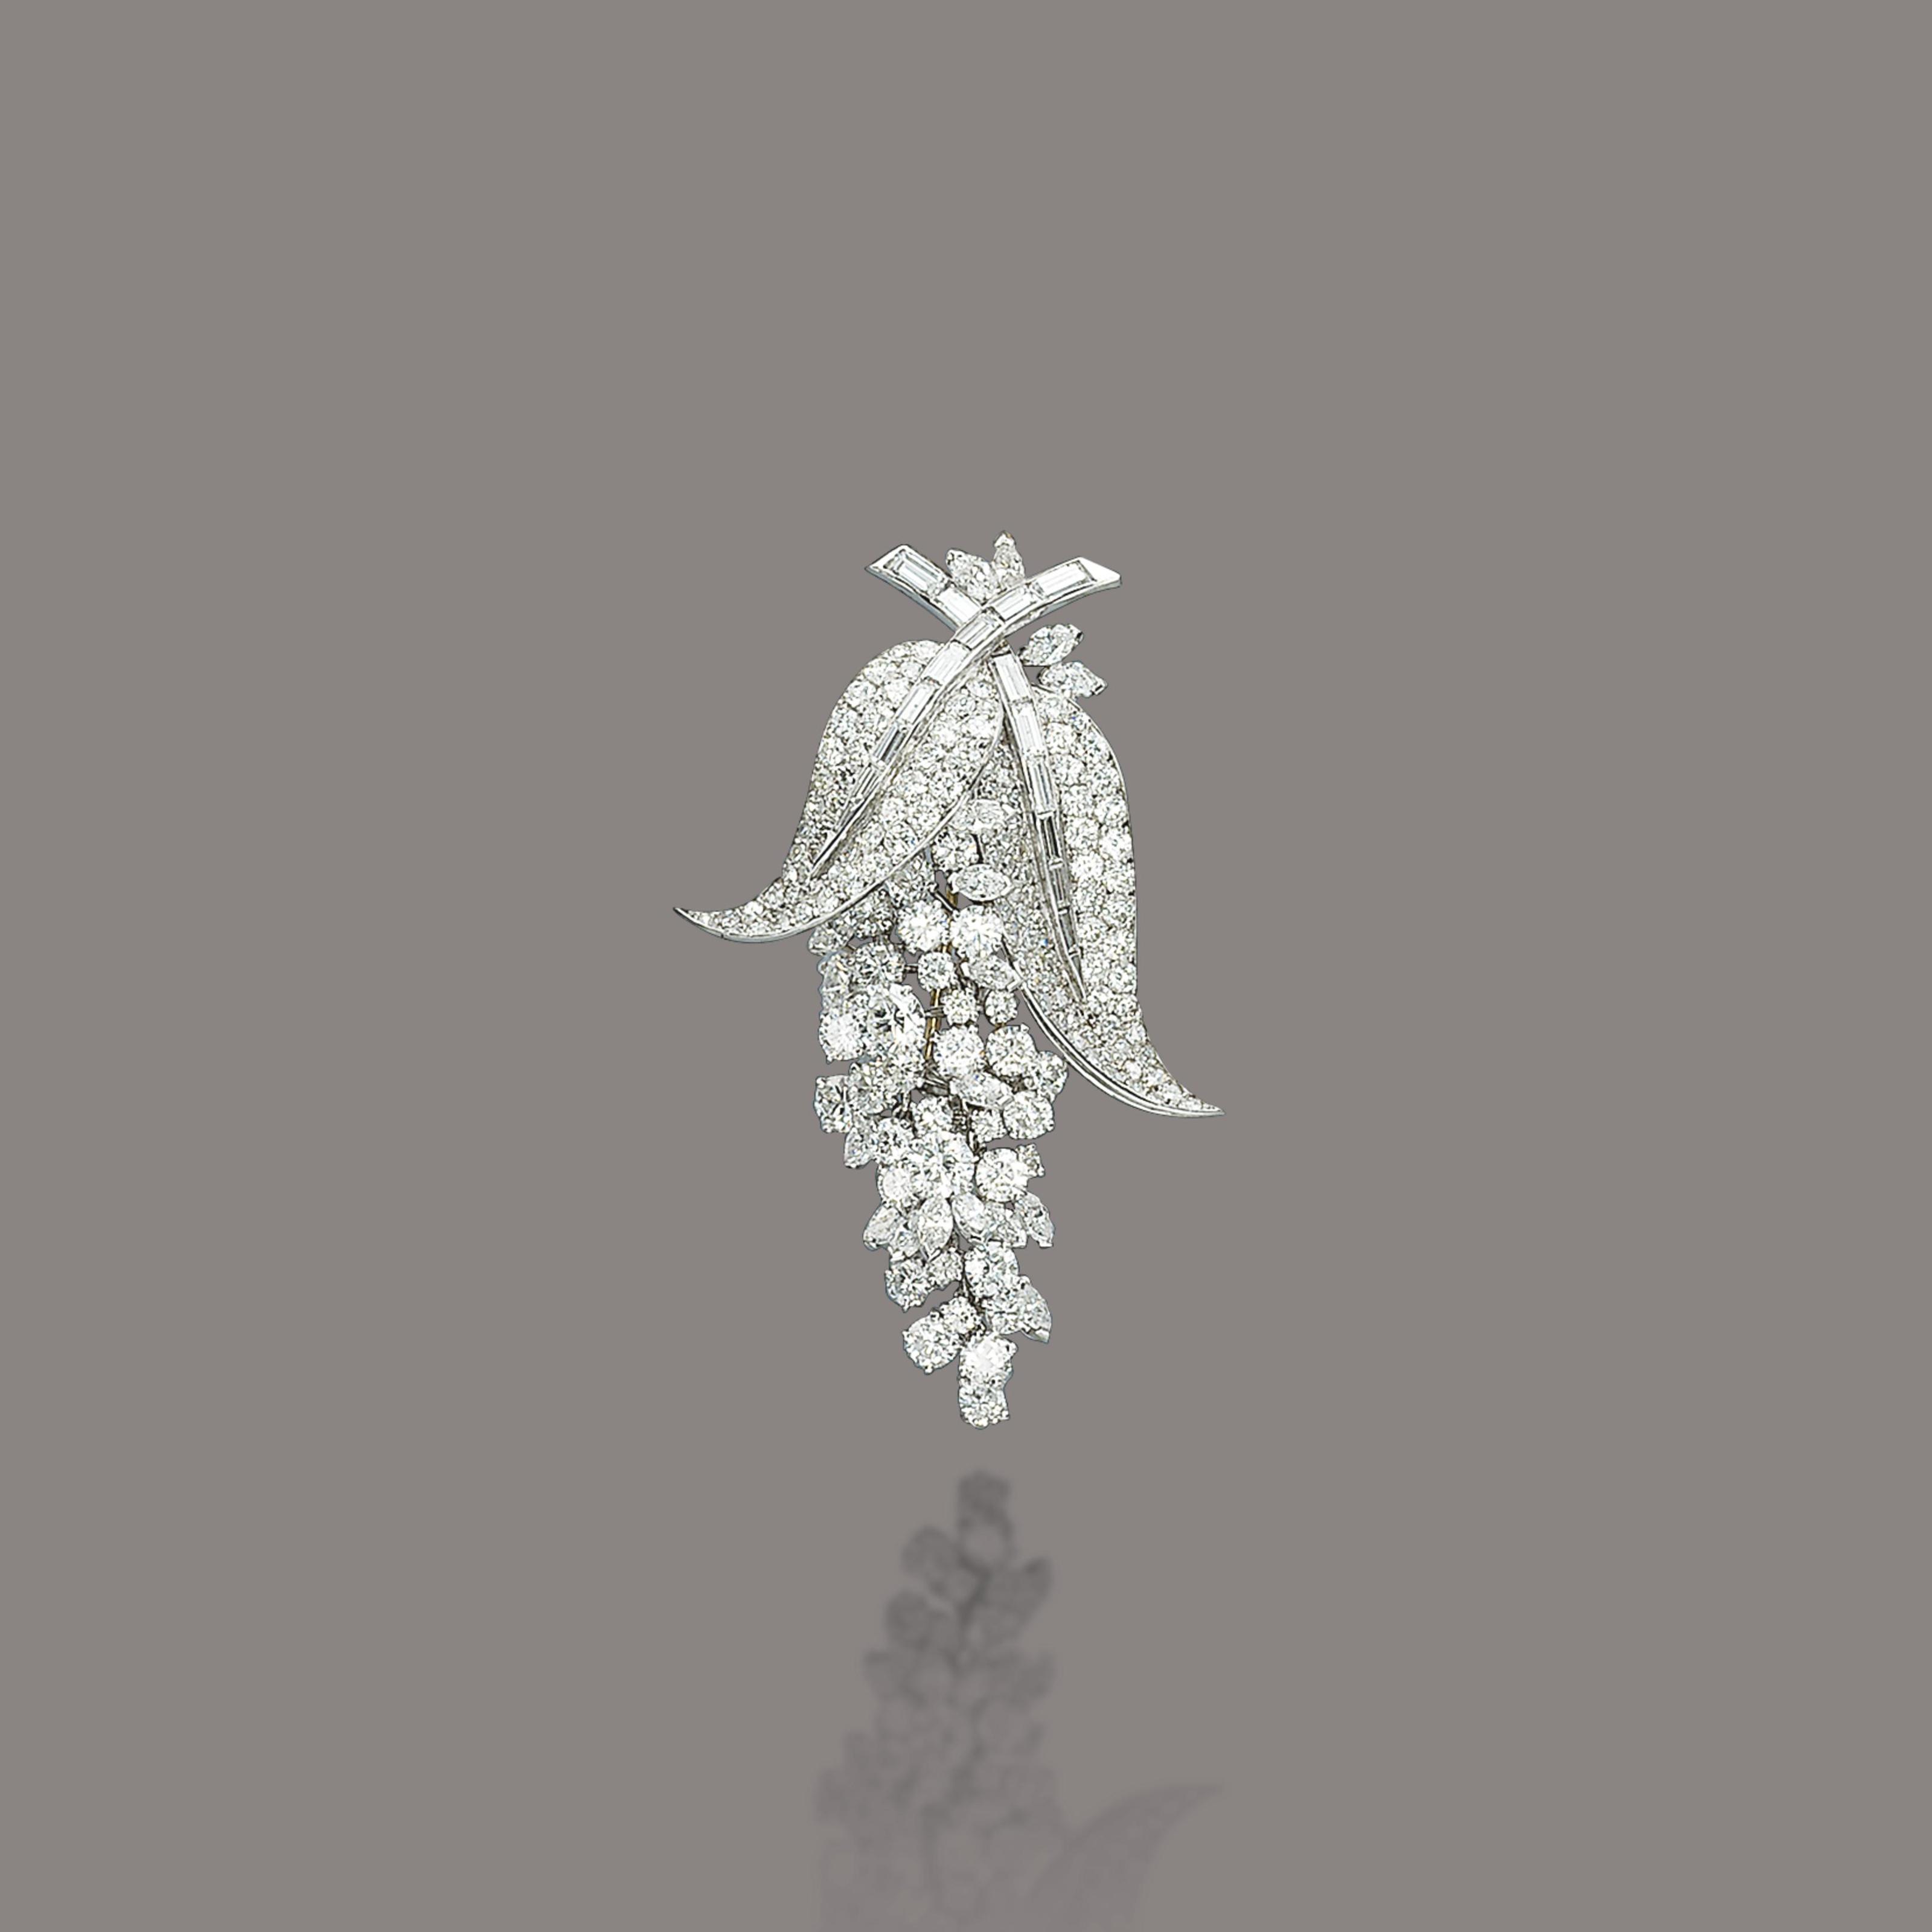 A DIAMOND BROOCH, BY MARCHAK